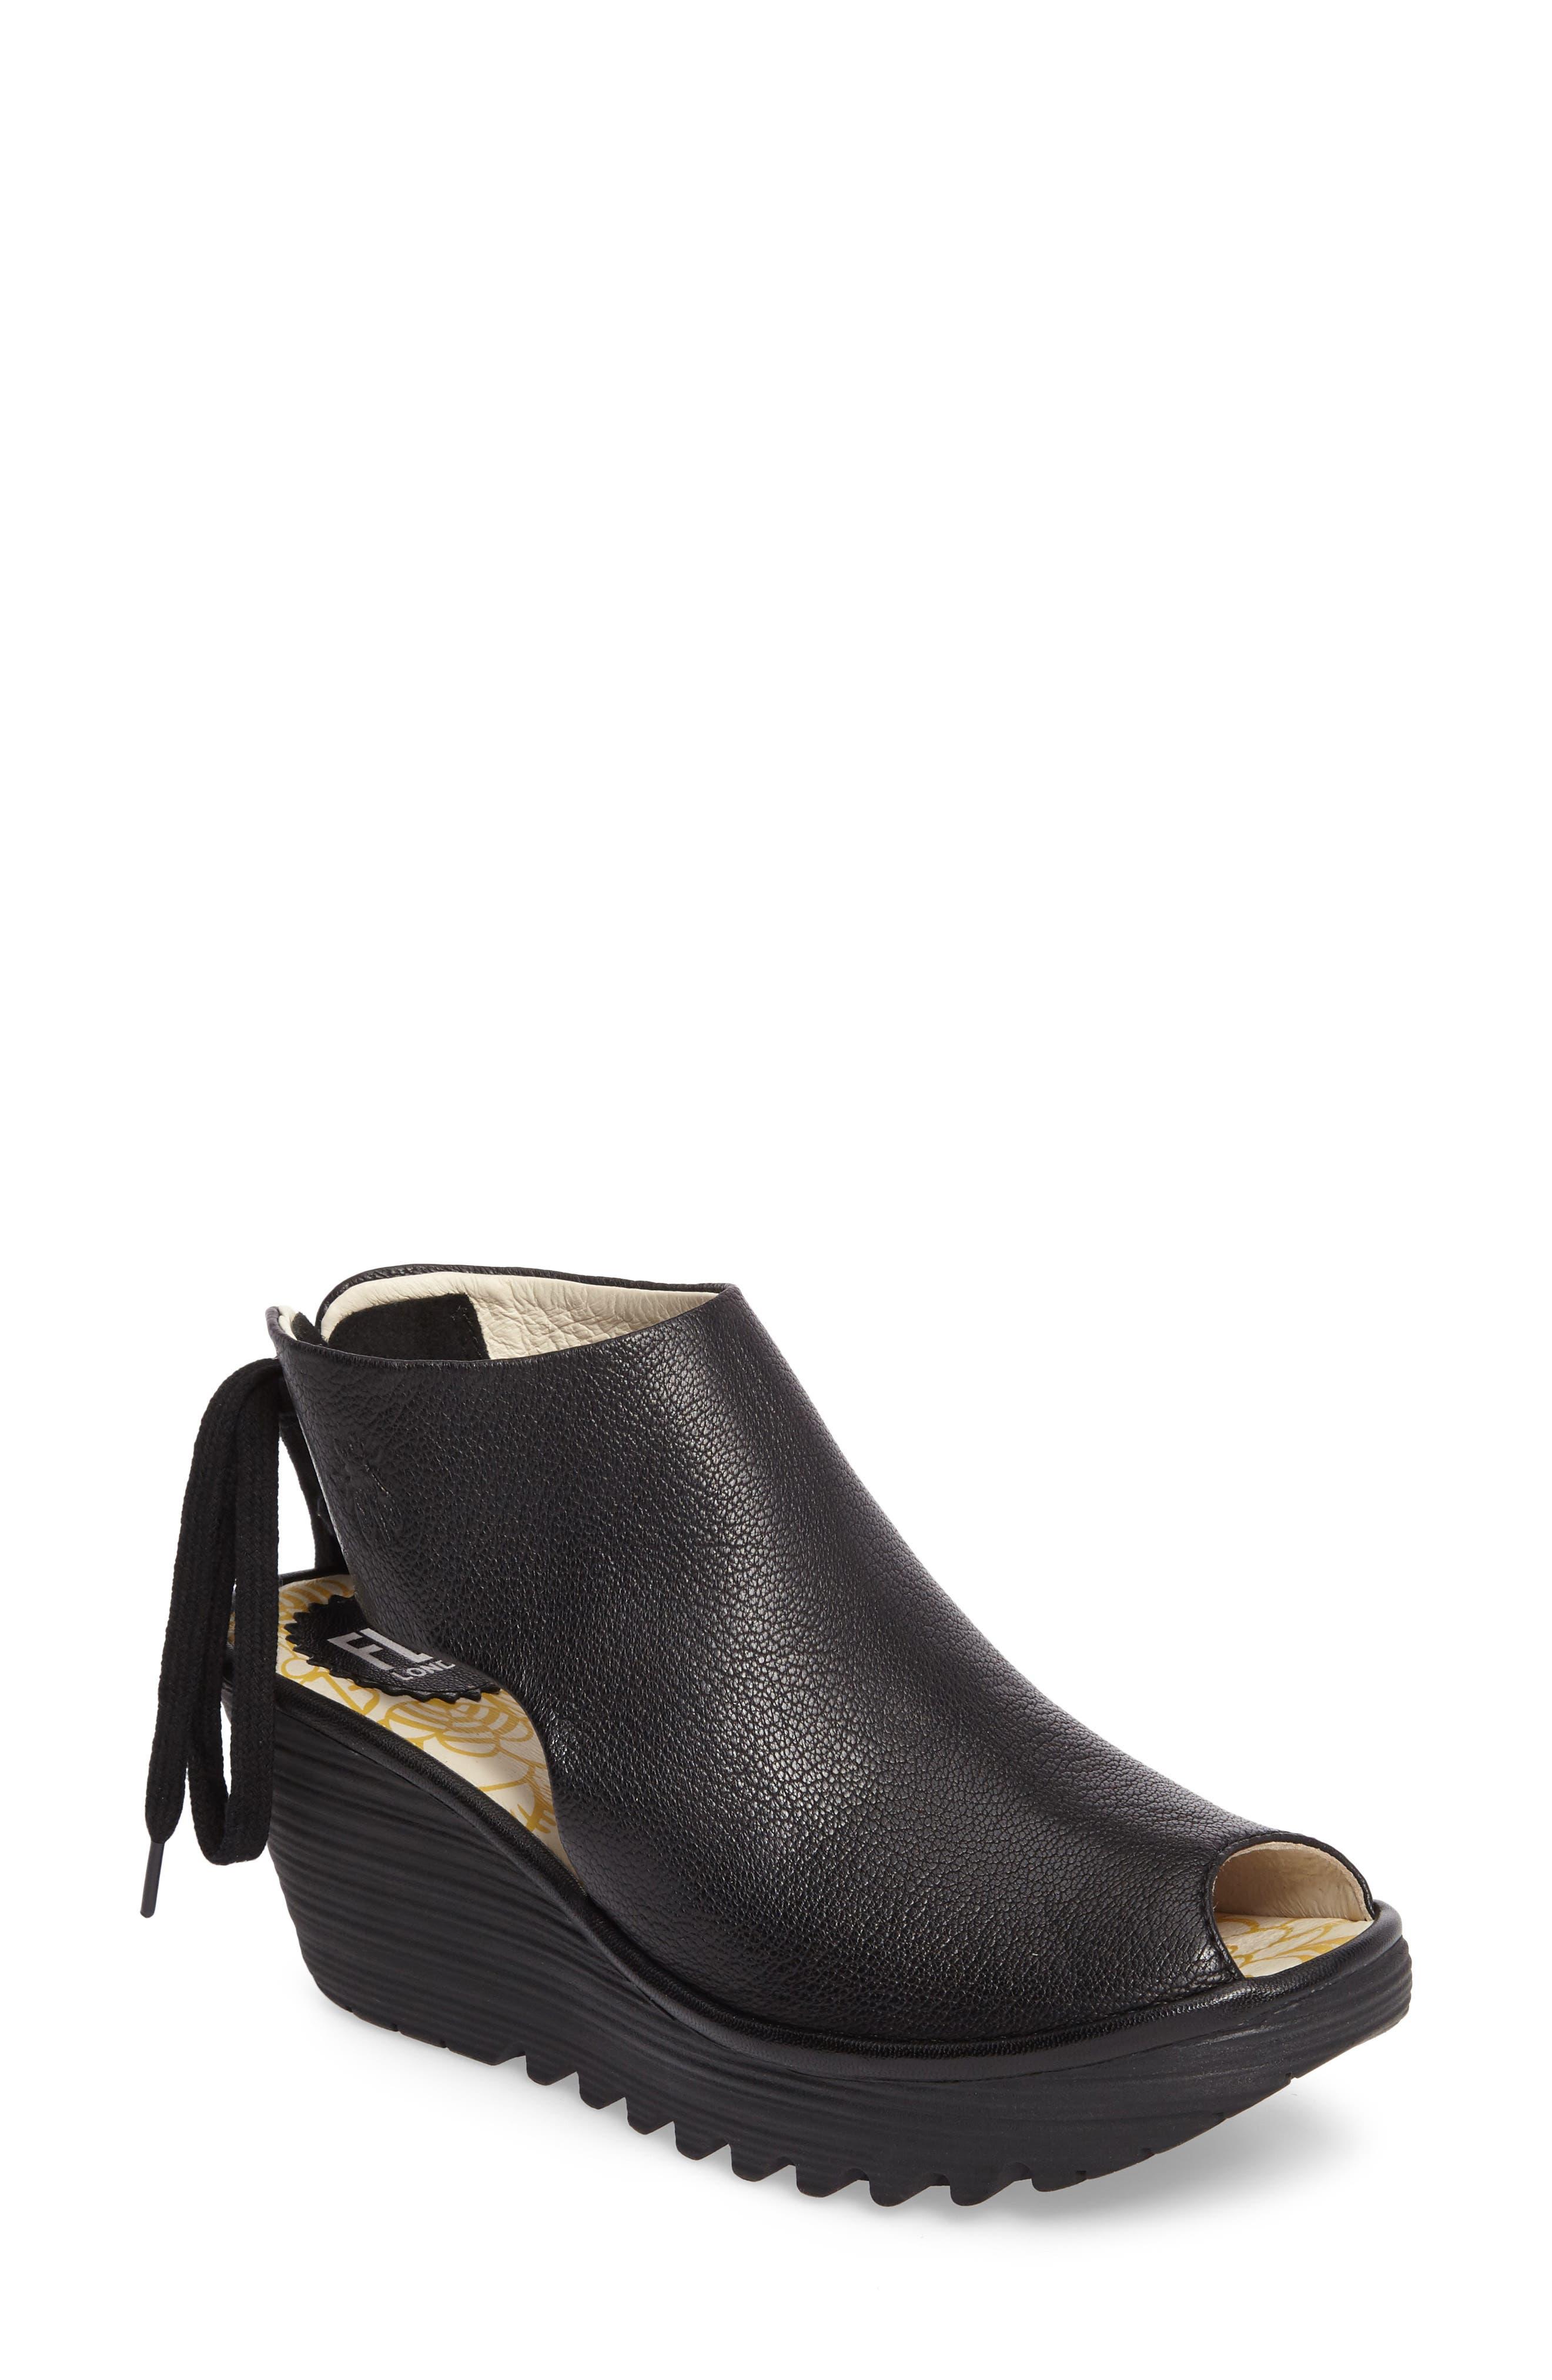 Yuzu Wedge Sandal,                             Main thumbnail 1, color,                             Black Mousse Leather